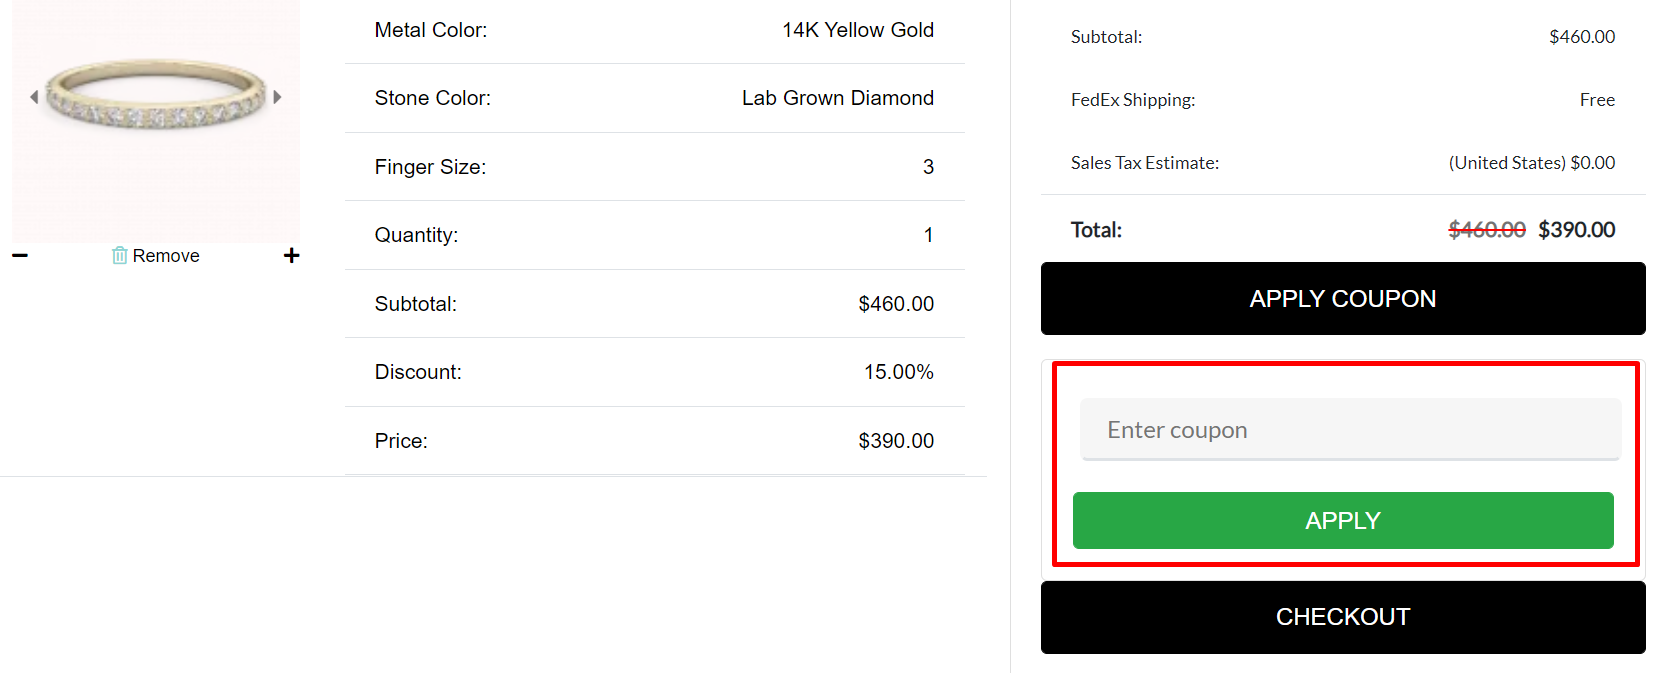 How do I use my Amcor Design coupon code?